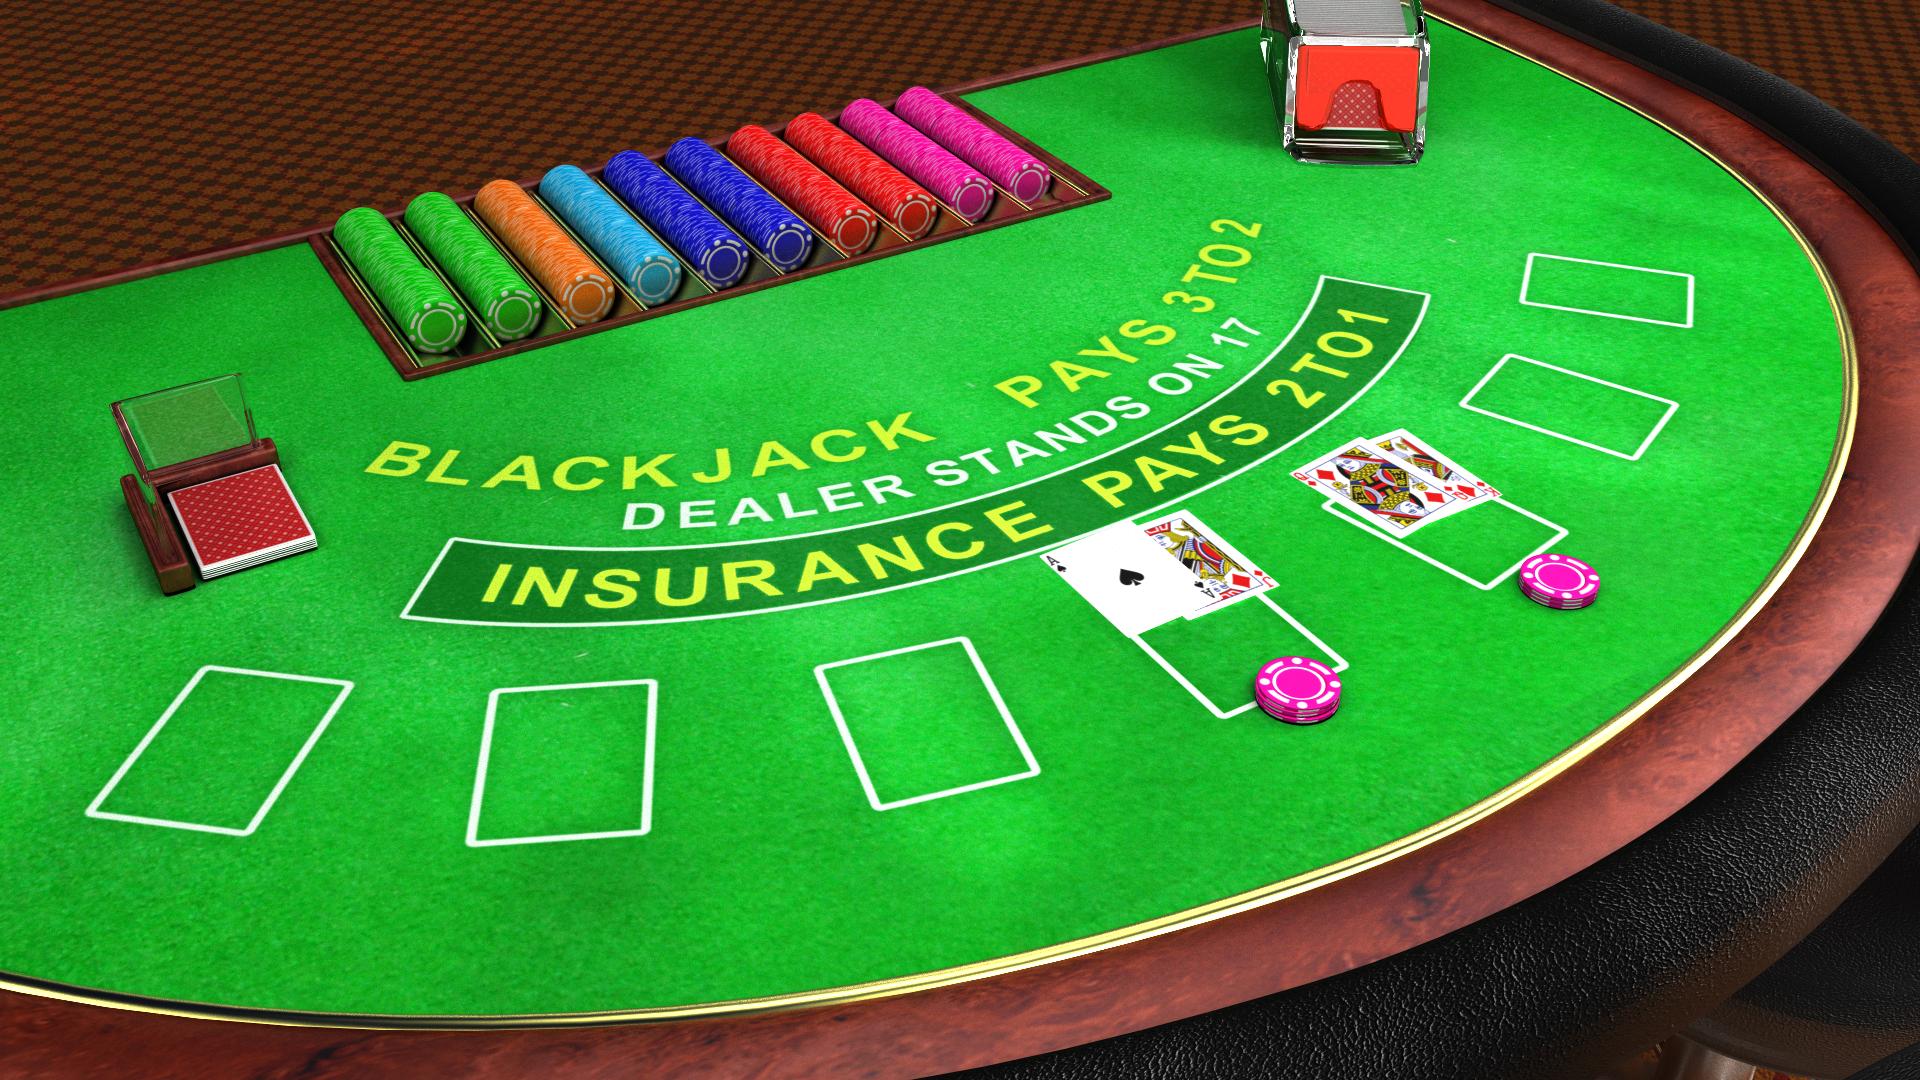 Blackjack table top view - Blackjack Table